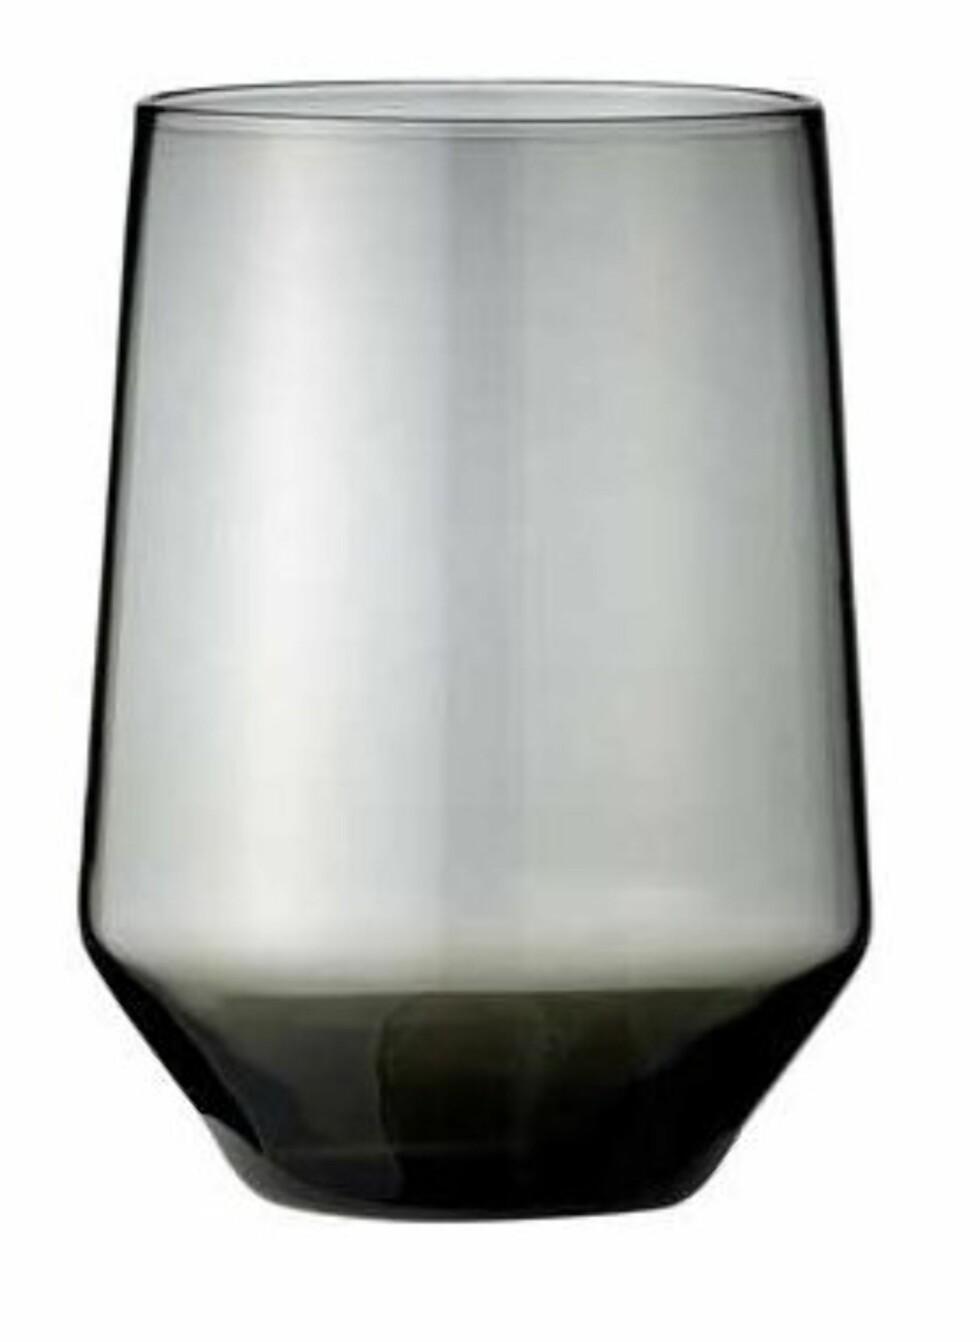 Glass (kr 75, Bloomingville).